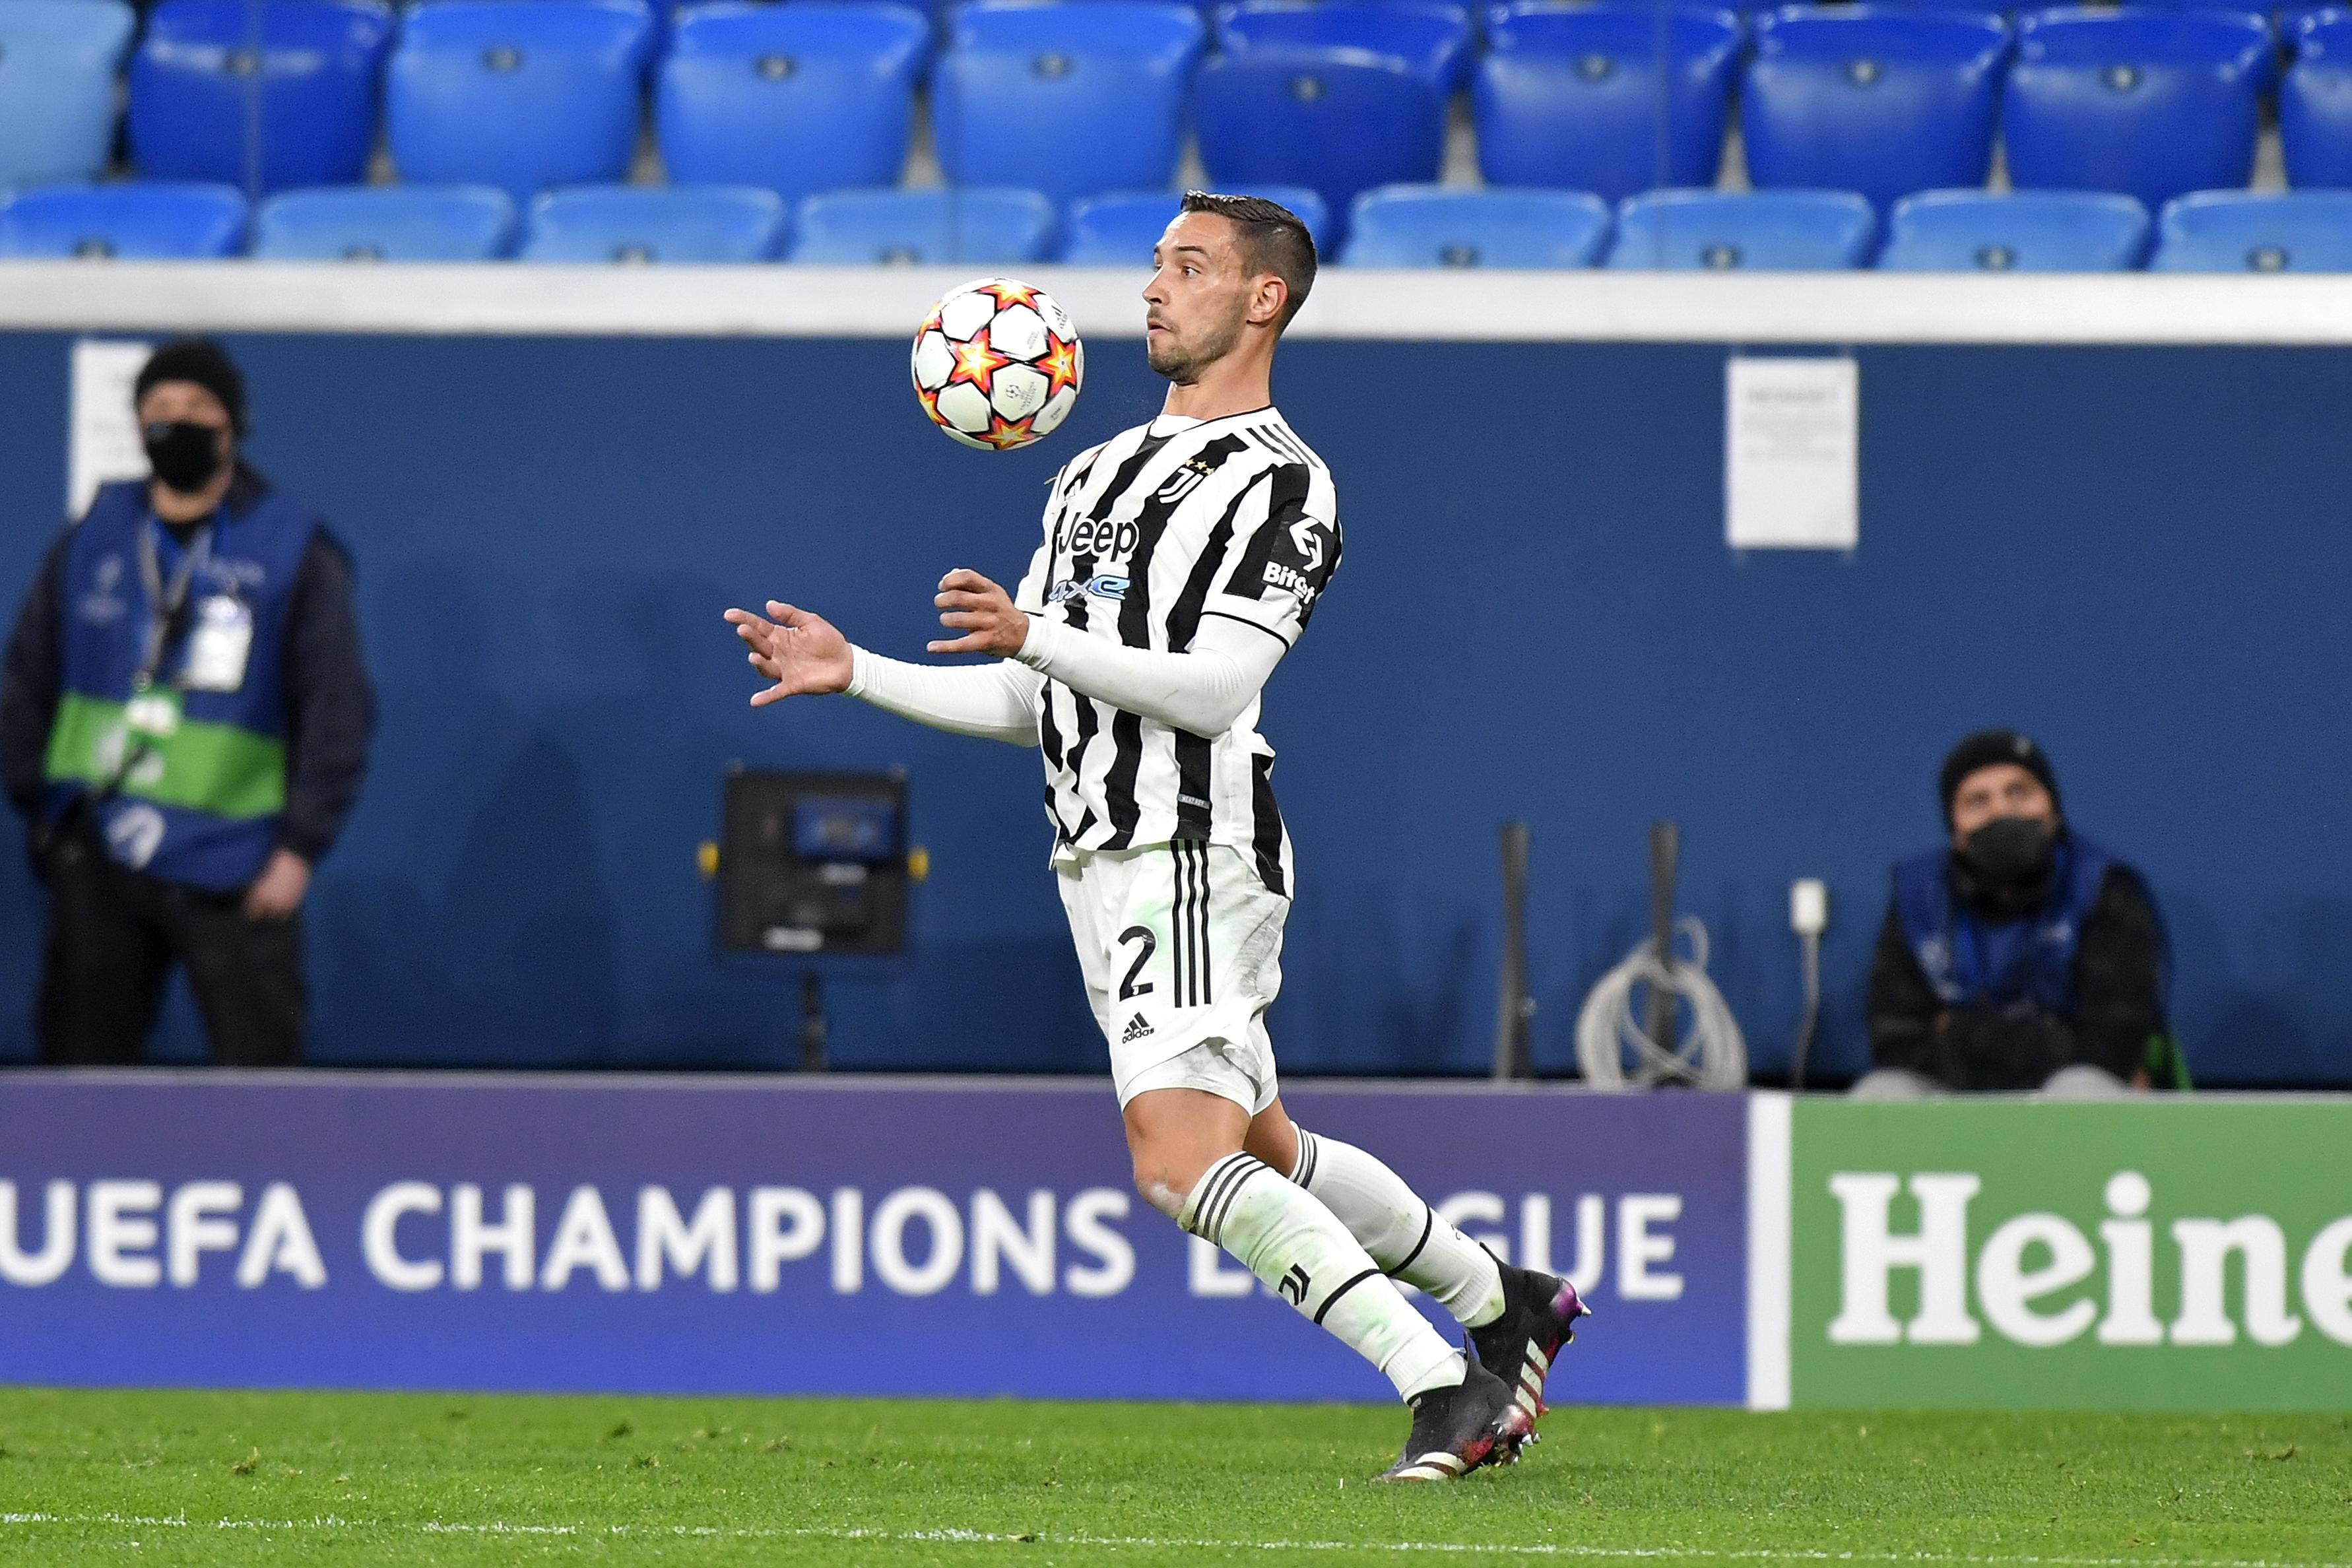 Zenit St. Petersburg v Juventus: Group H - UEFA Champions League